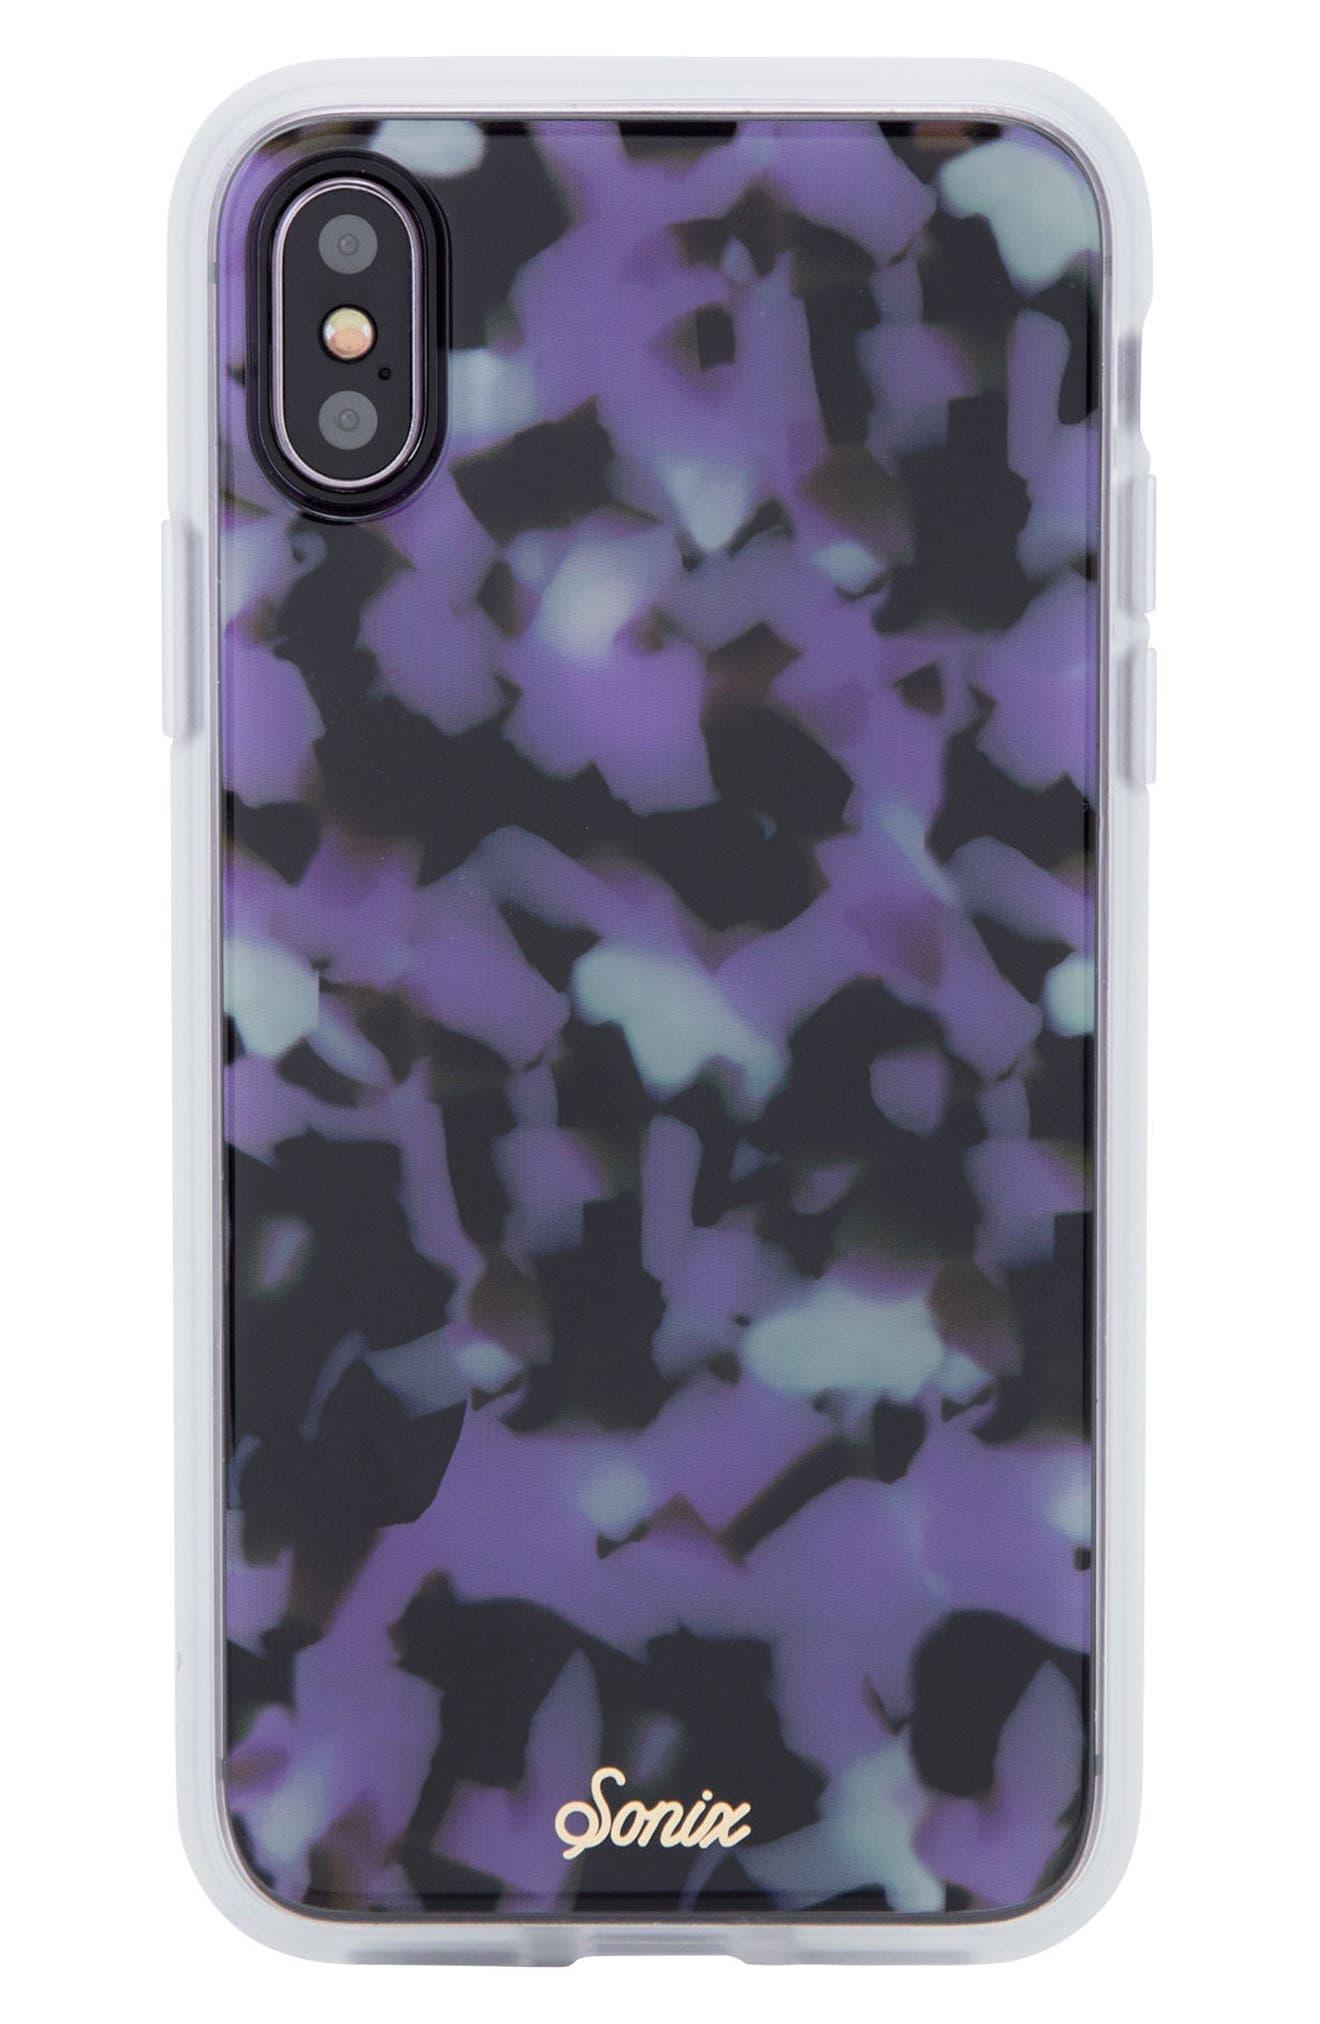 Sonix Terrazzo Lilac iPhone X Case